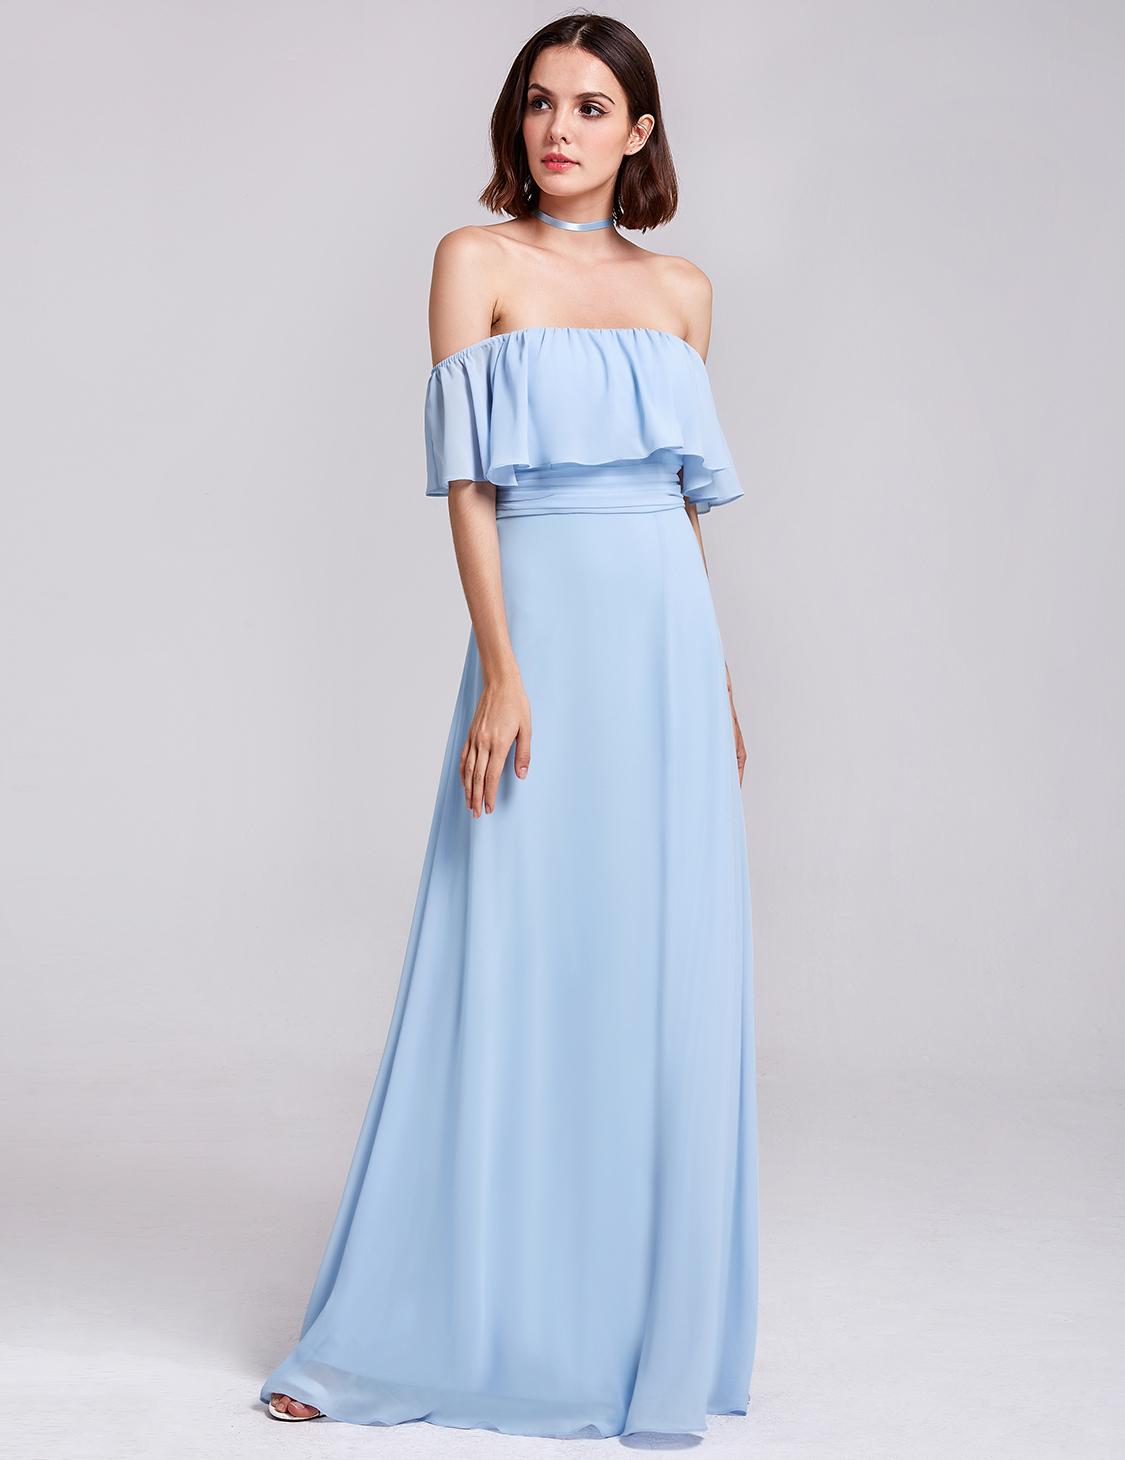 d46bf361020 Ever-Pretty Long Off Shoulder Bridesmaid Dresses Split Evening Prom ...